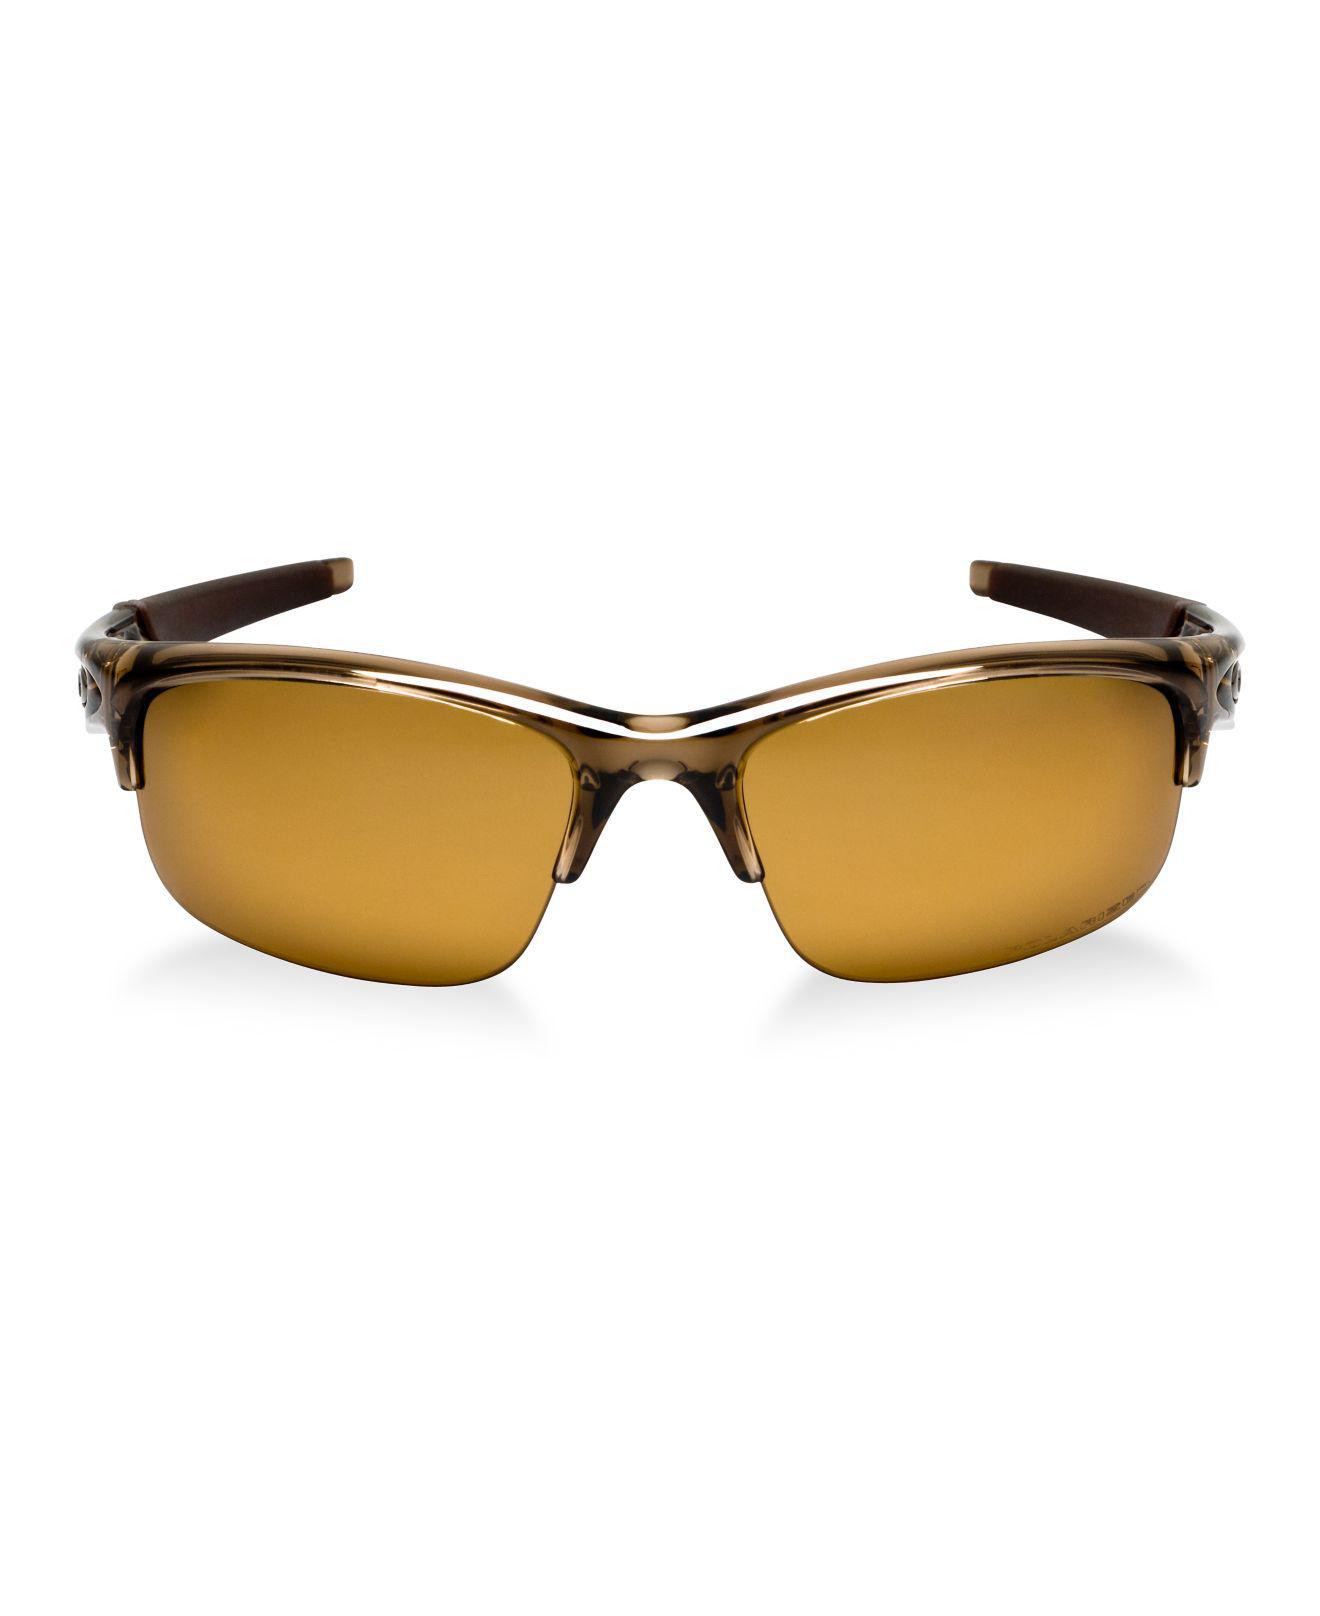 ef22a88382 Lyst - Oakley Sunglasses